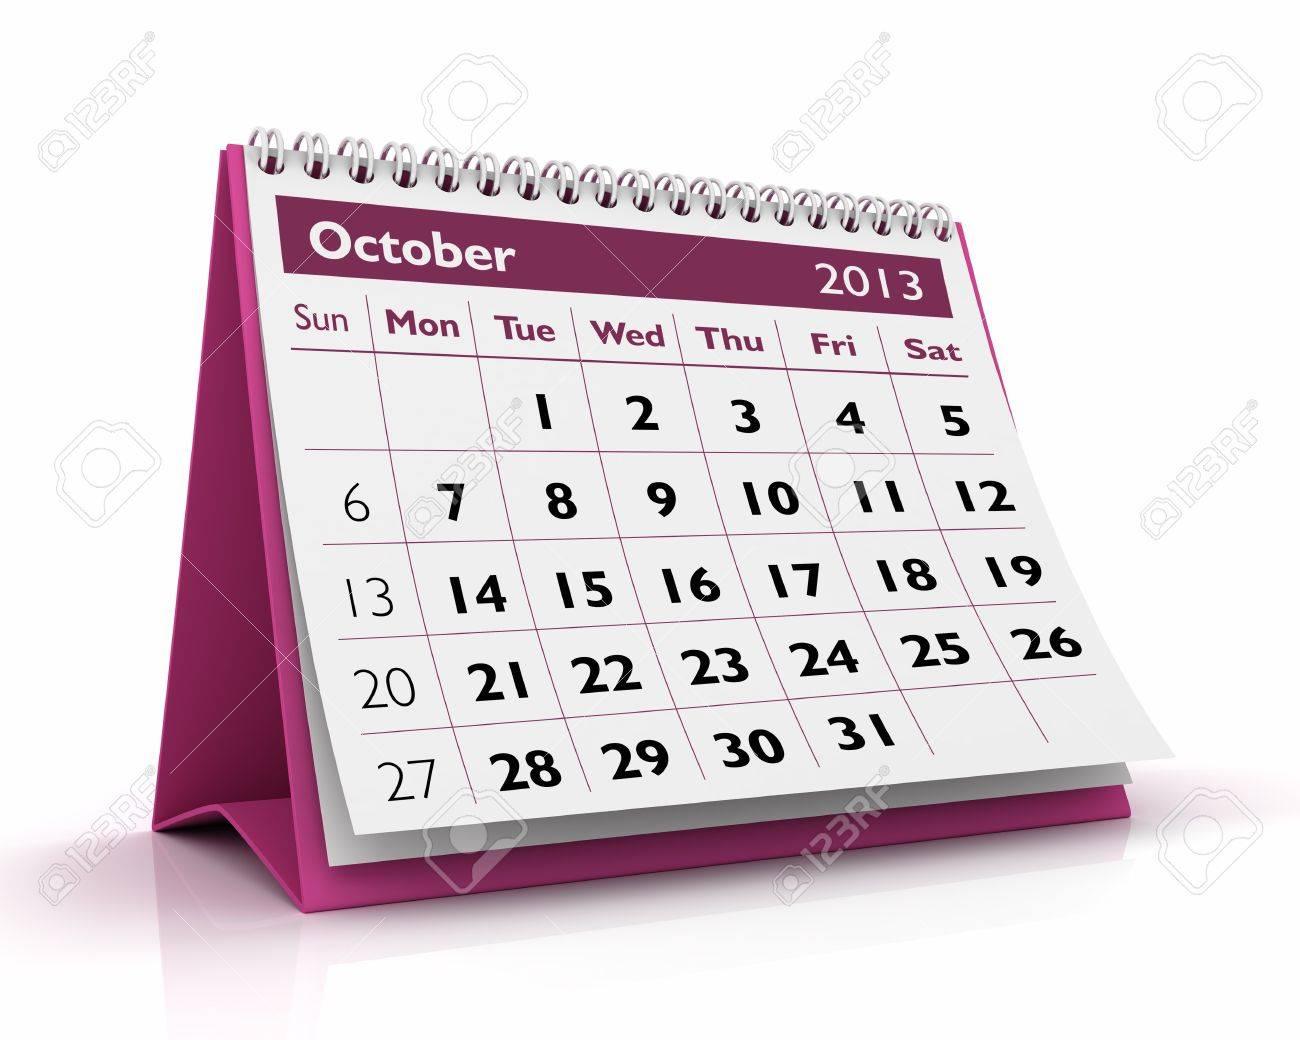 October desktop calendar 2013 in white background Stock Photo - 17380247